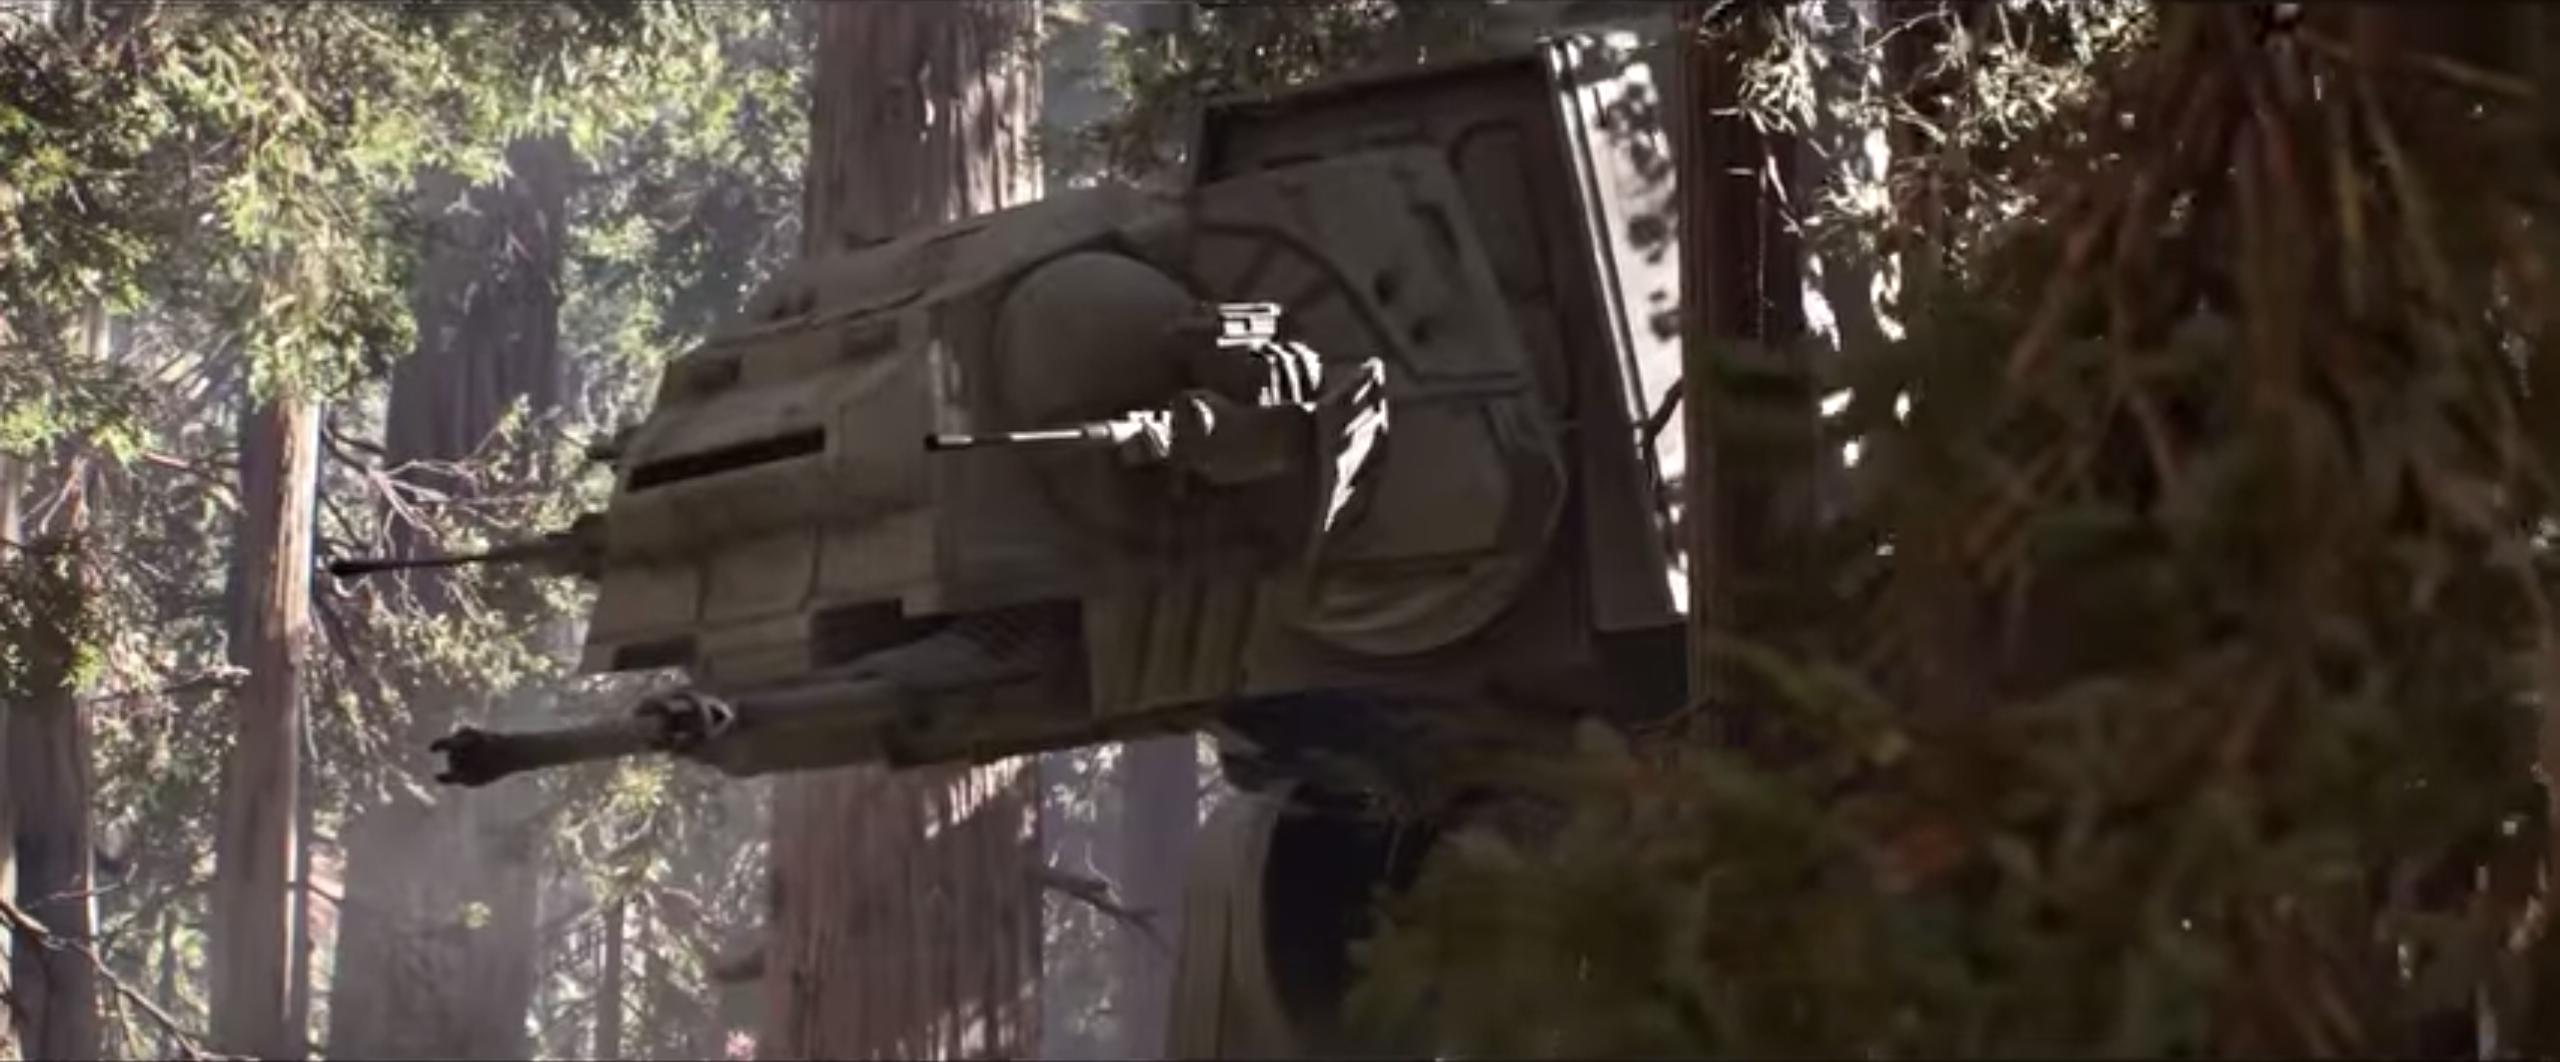 The Star Wars Battlefront open beta starts October 8th